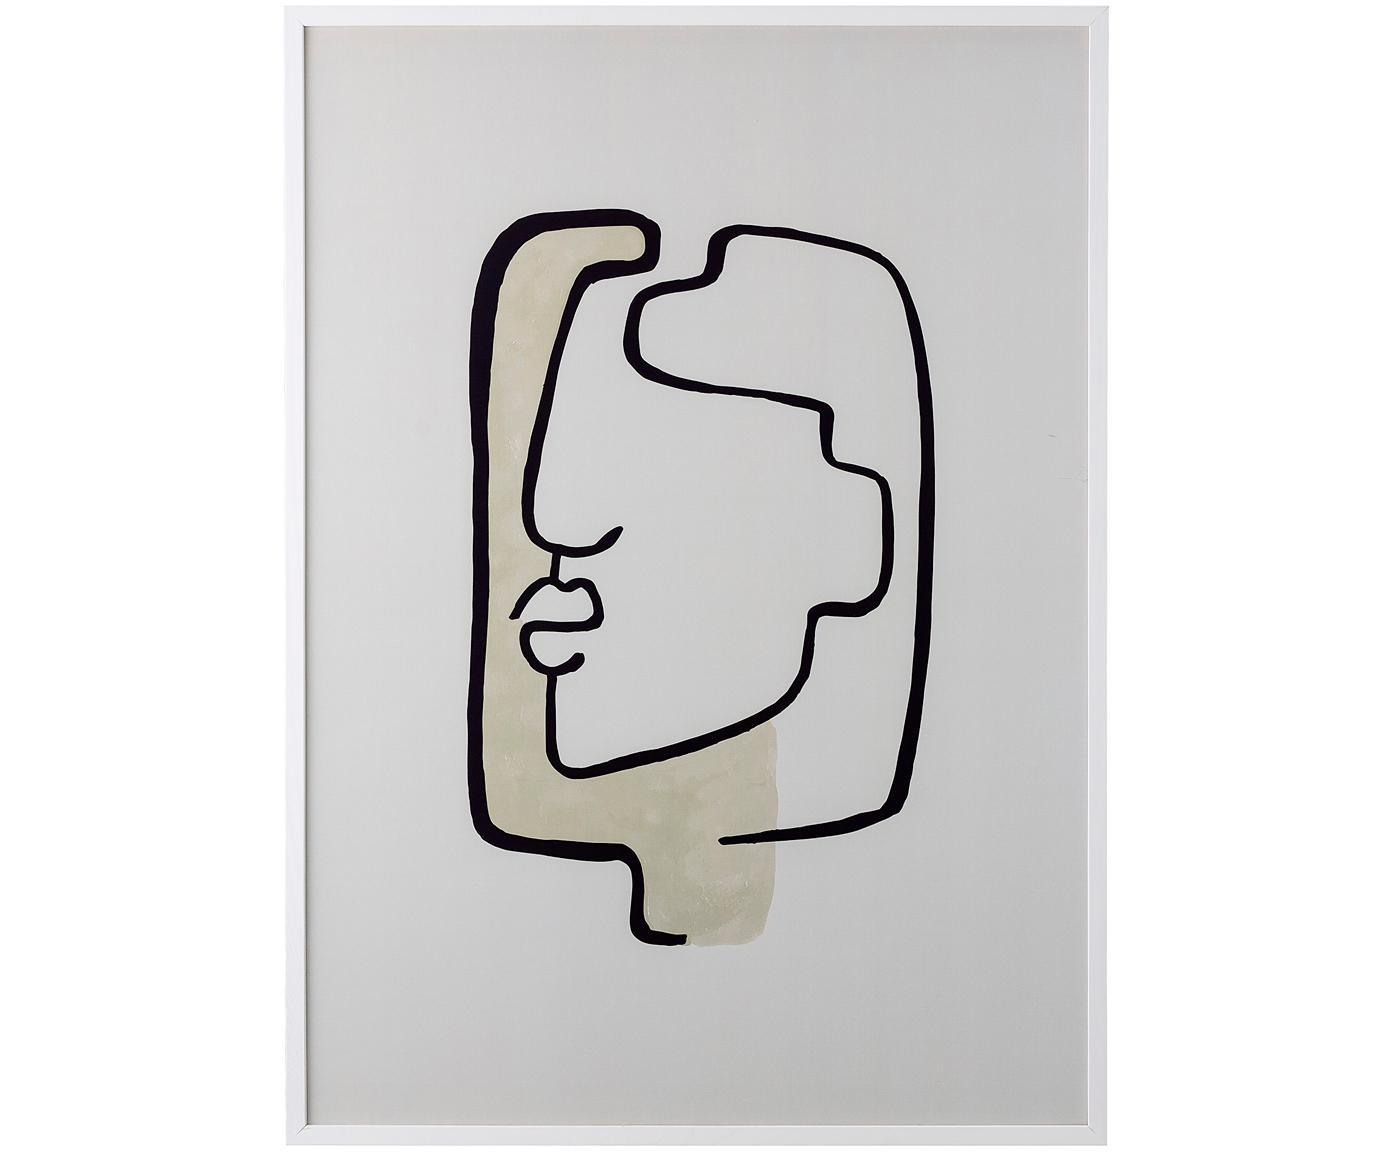 Stampa digitale incorniciata Tessa, Cornice: legno, Immagine: carta, Beige, bianco, nero, Larg. 52 x Alt. 72 cm